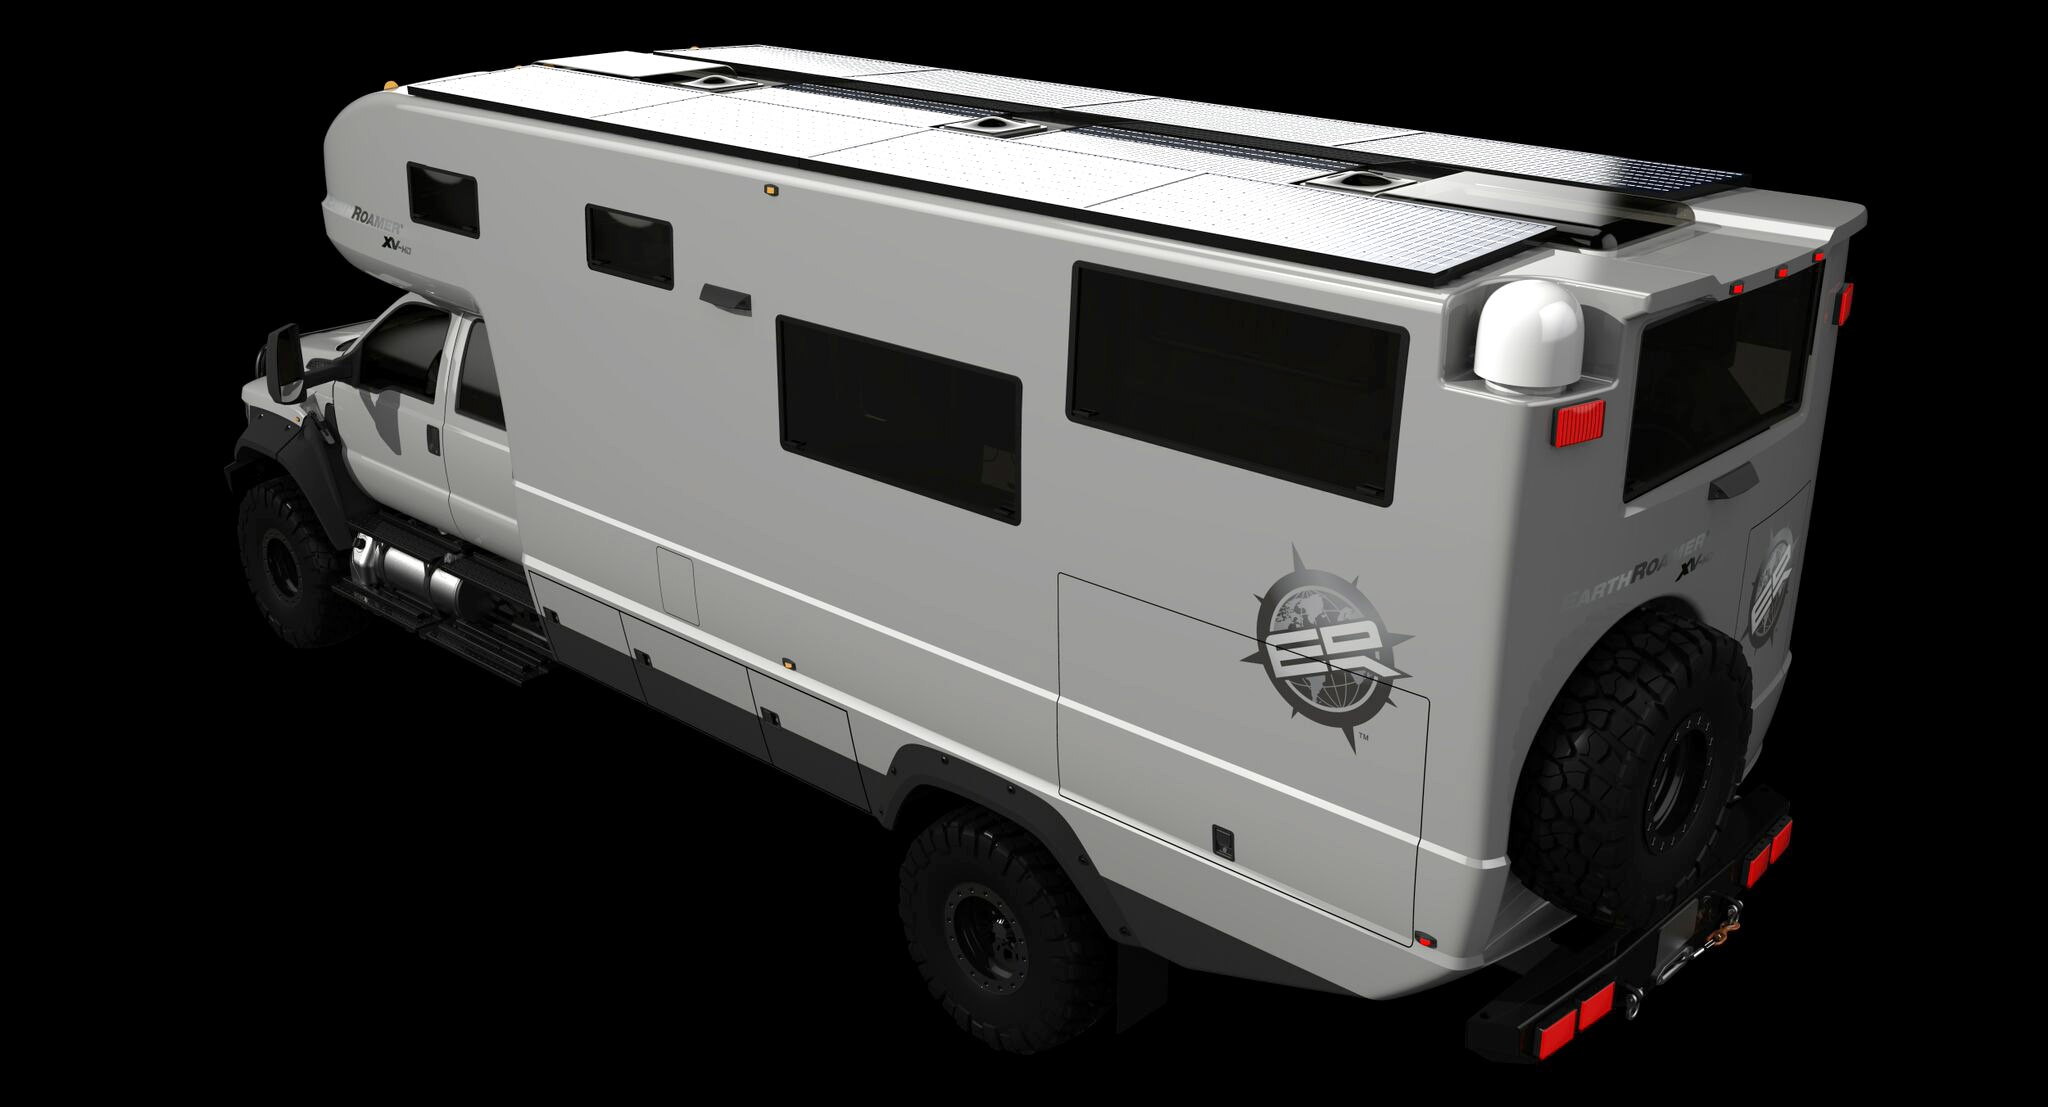 Earthroamer Xv Hd Is A Ford F 650 Based Rv Worth Almost 1